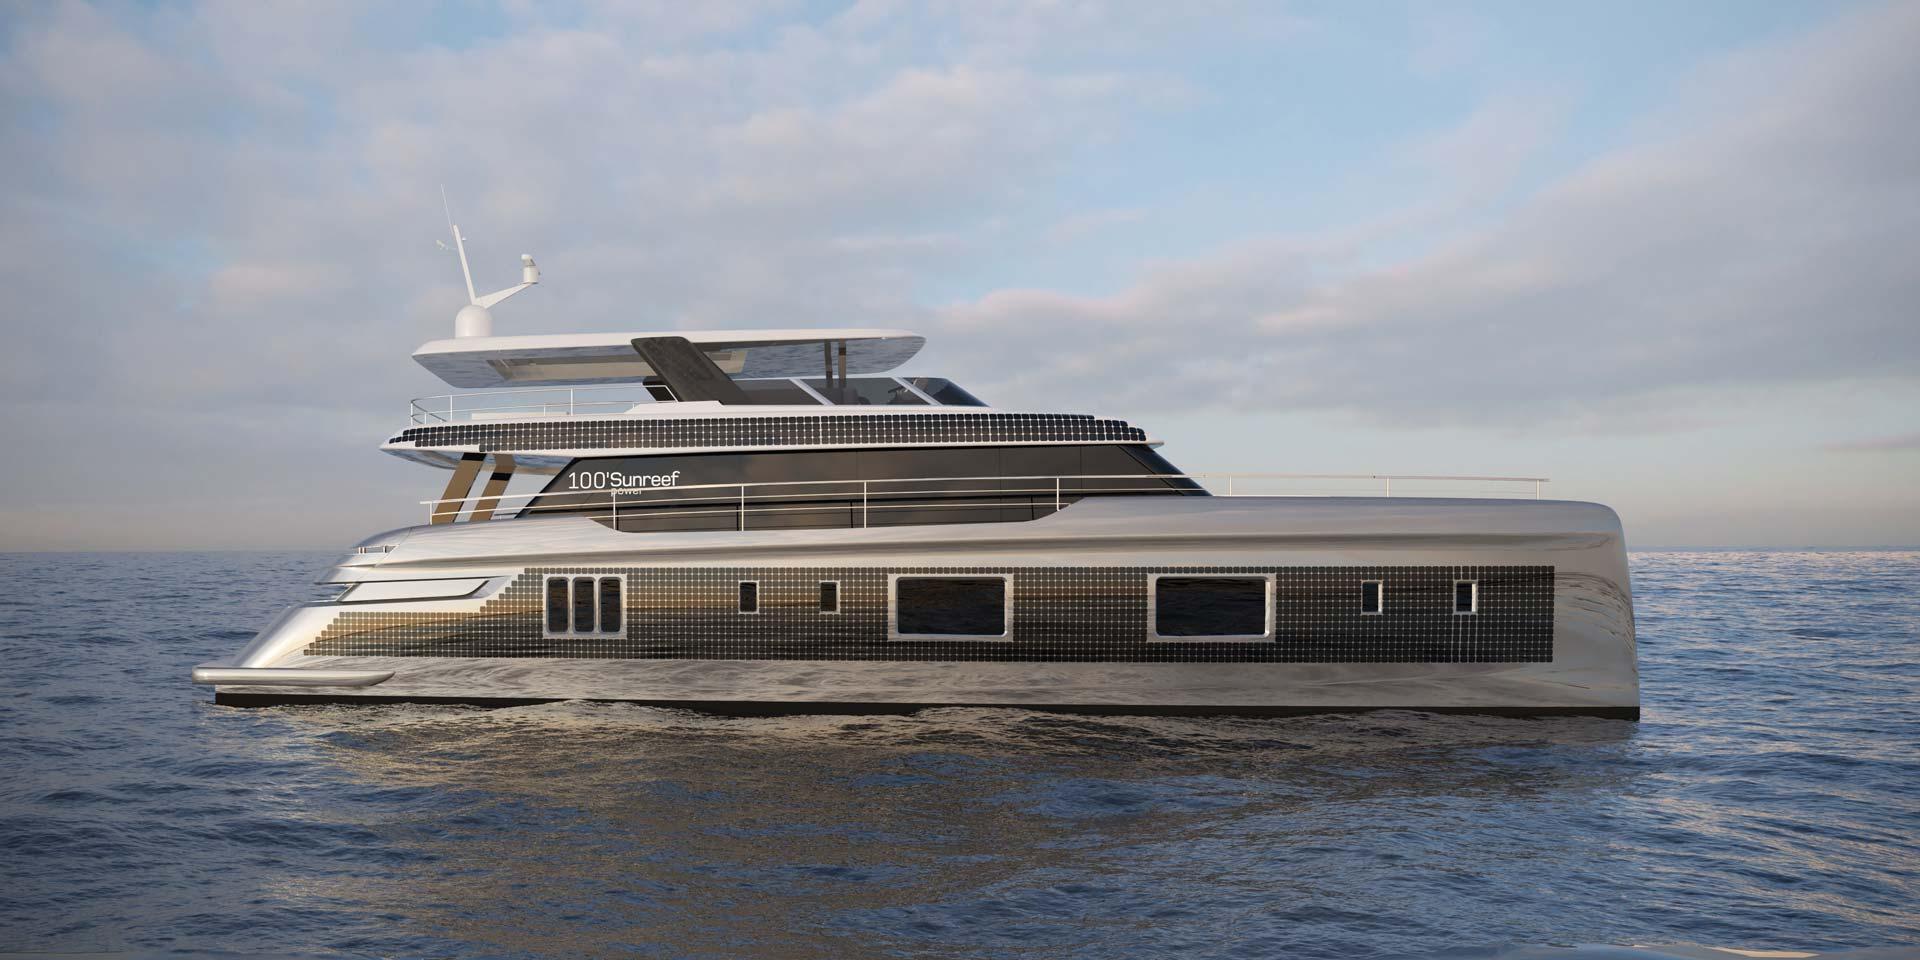 Jacht Sunreef Power Eco 100